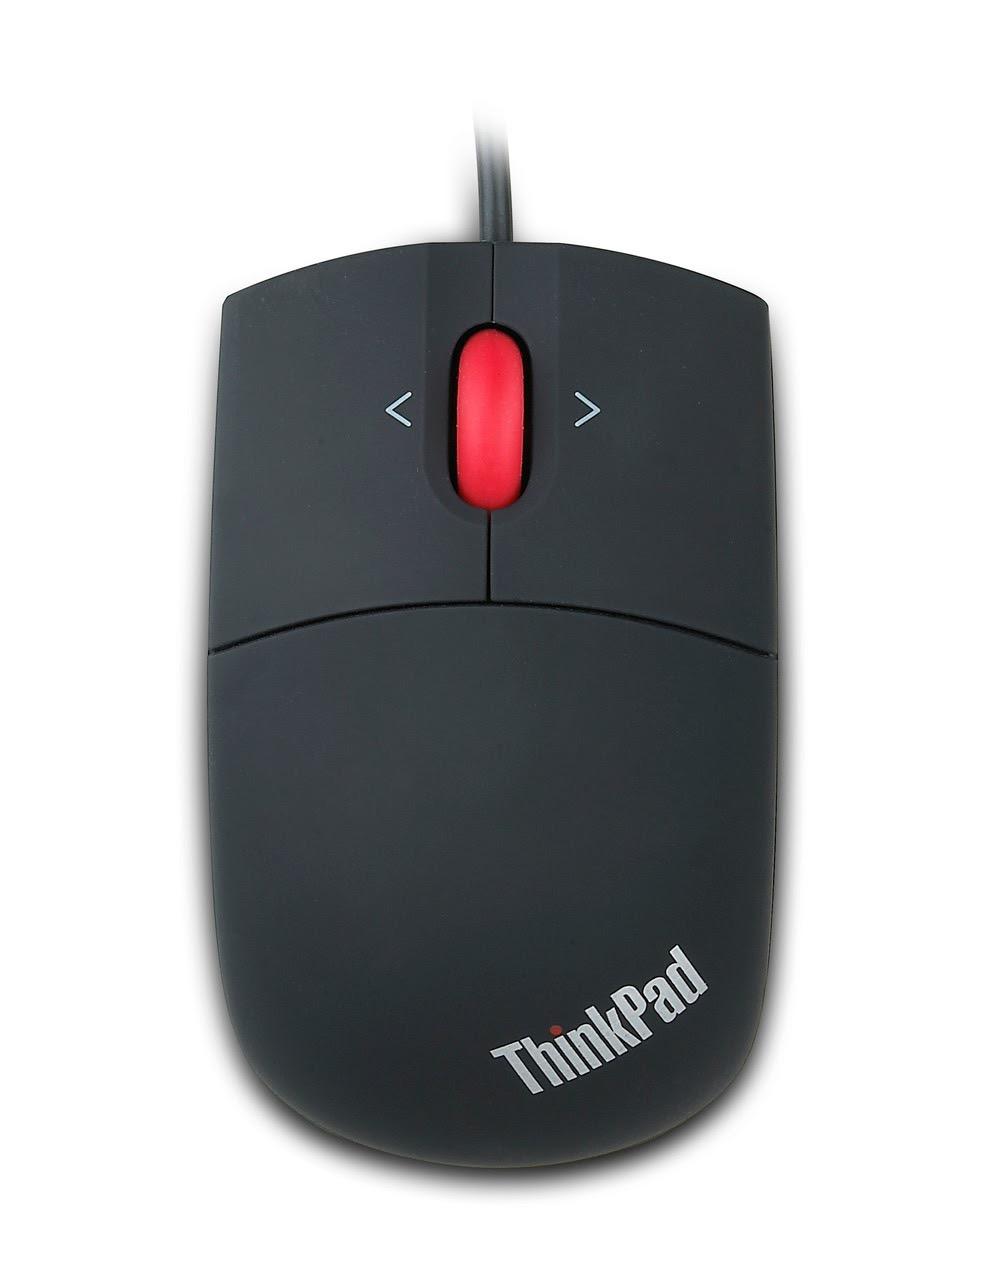 Фото 1. Мышь Lenovo ThinkPad USB Laser Mouse (57Y4635)